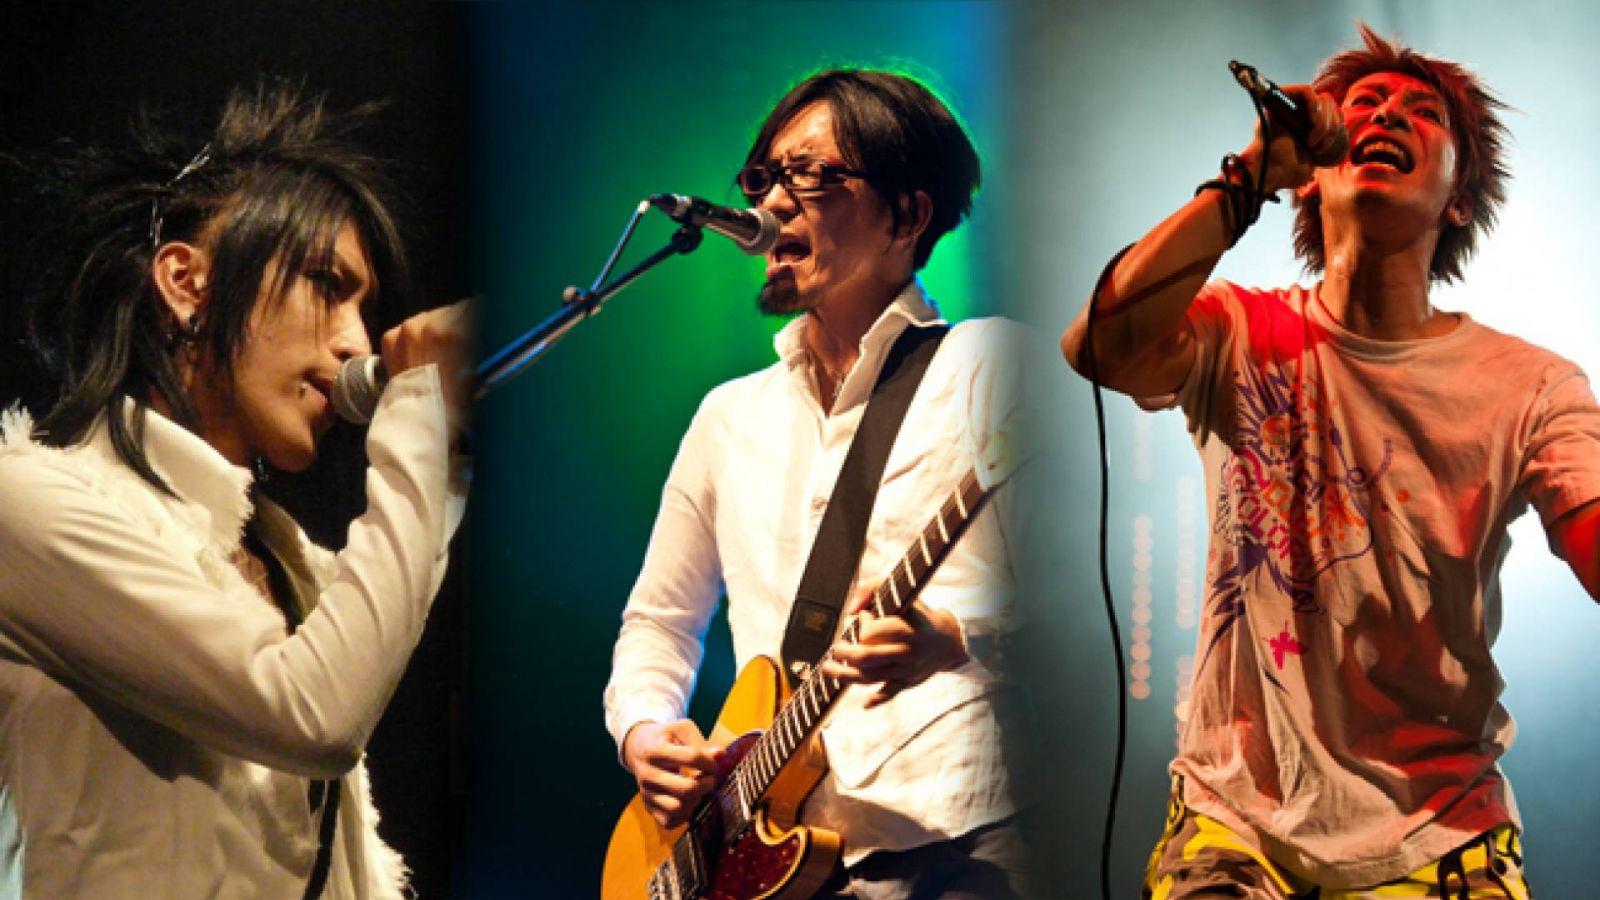 Japan Expo 2010 – День Первый © HITT / Doping Panda / die!!die!!color!! - JaME - Vanessa Aubry / Didier CABOCHE